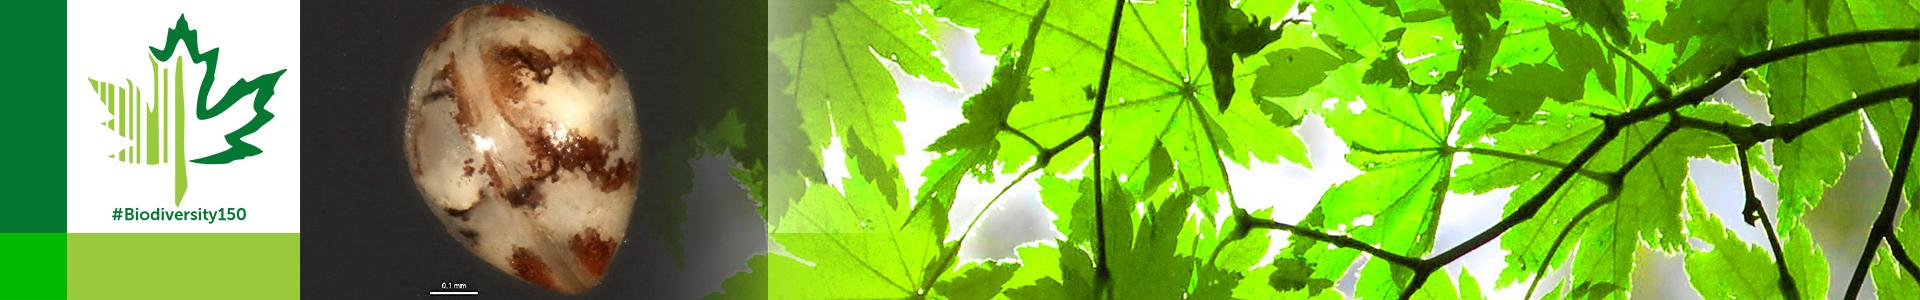 #Biodiversity150 number 142 of 150 Cypridopsis vidua